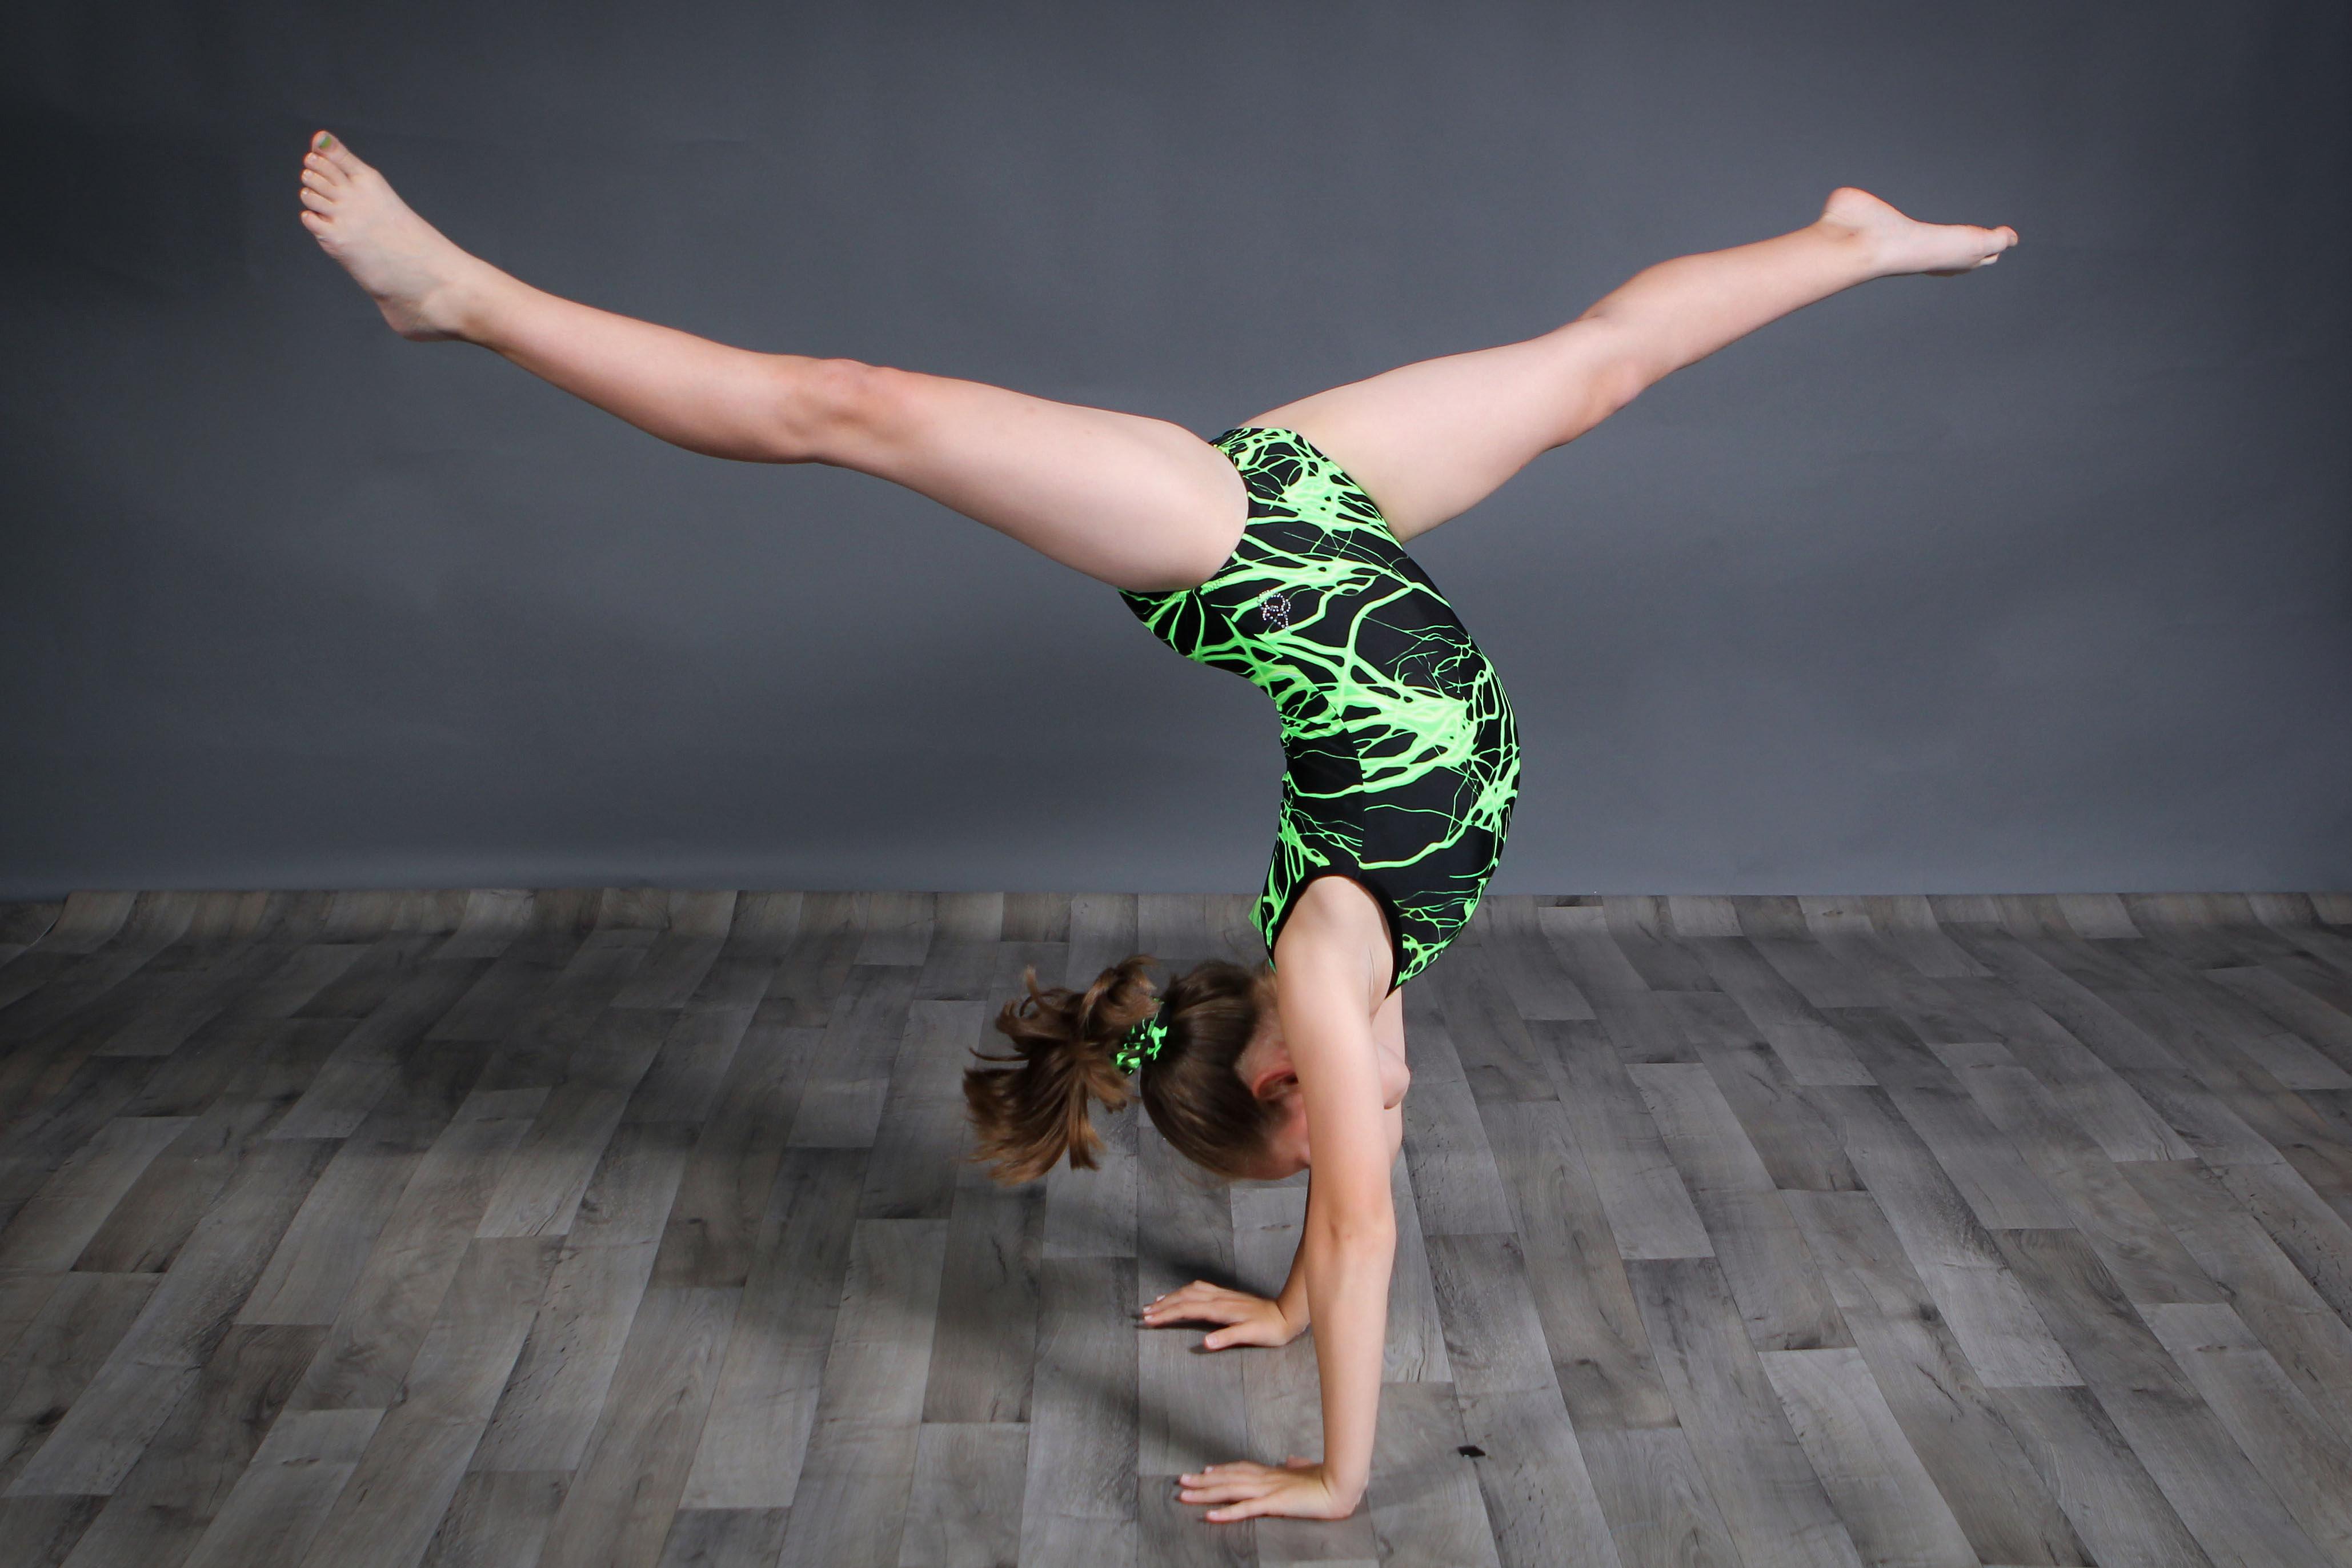 Greater Napanee Gymnastics Club Img 3920 Jpg